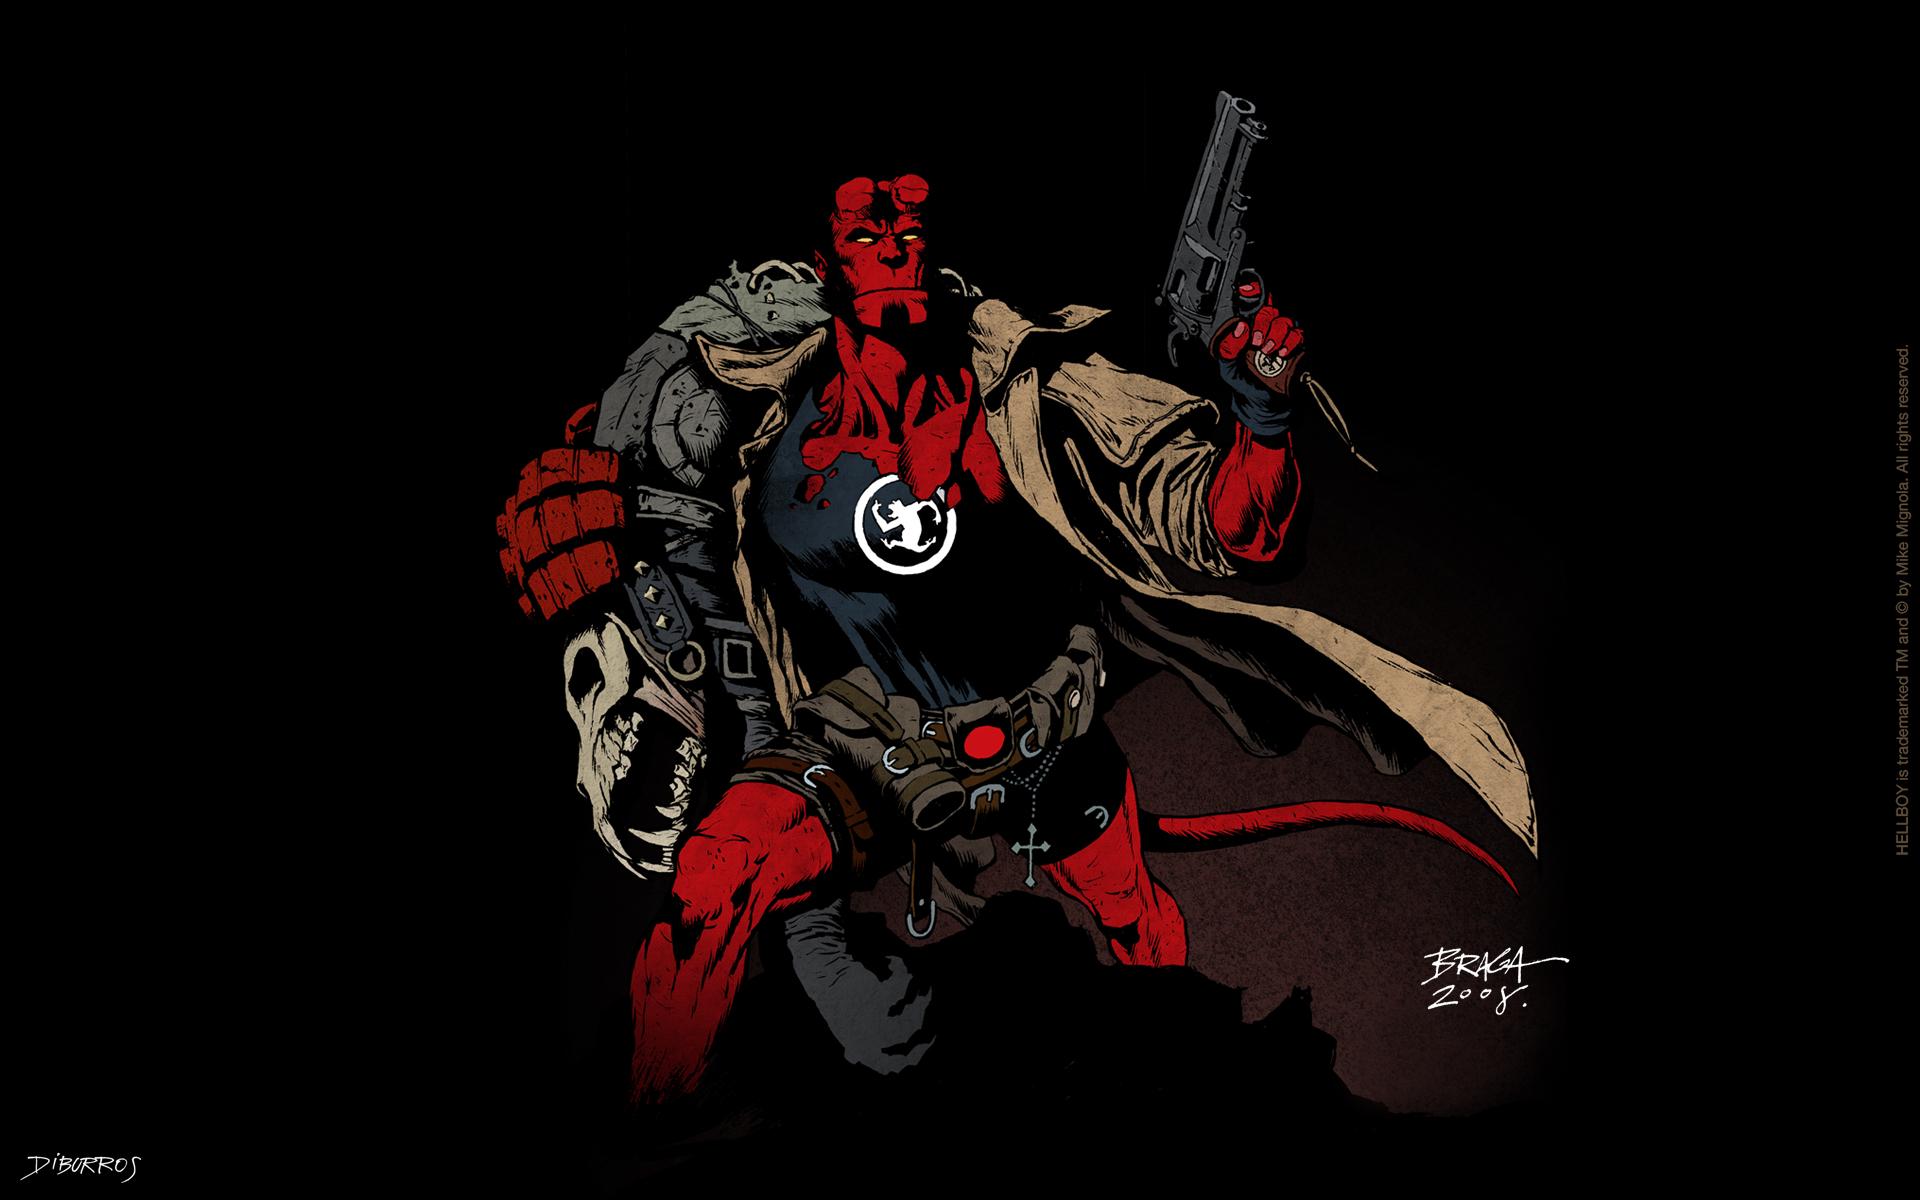 Download Hellboy Wallpaper 1920x1200 Wallpoper 371969 1920x1200